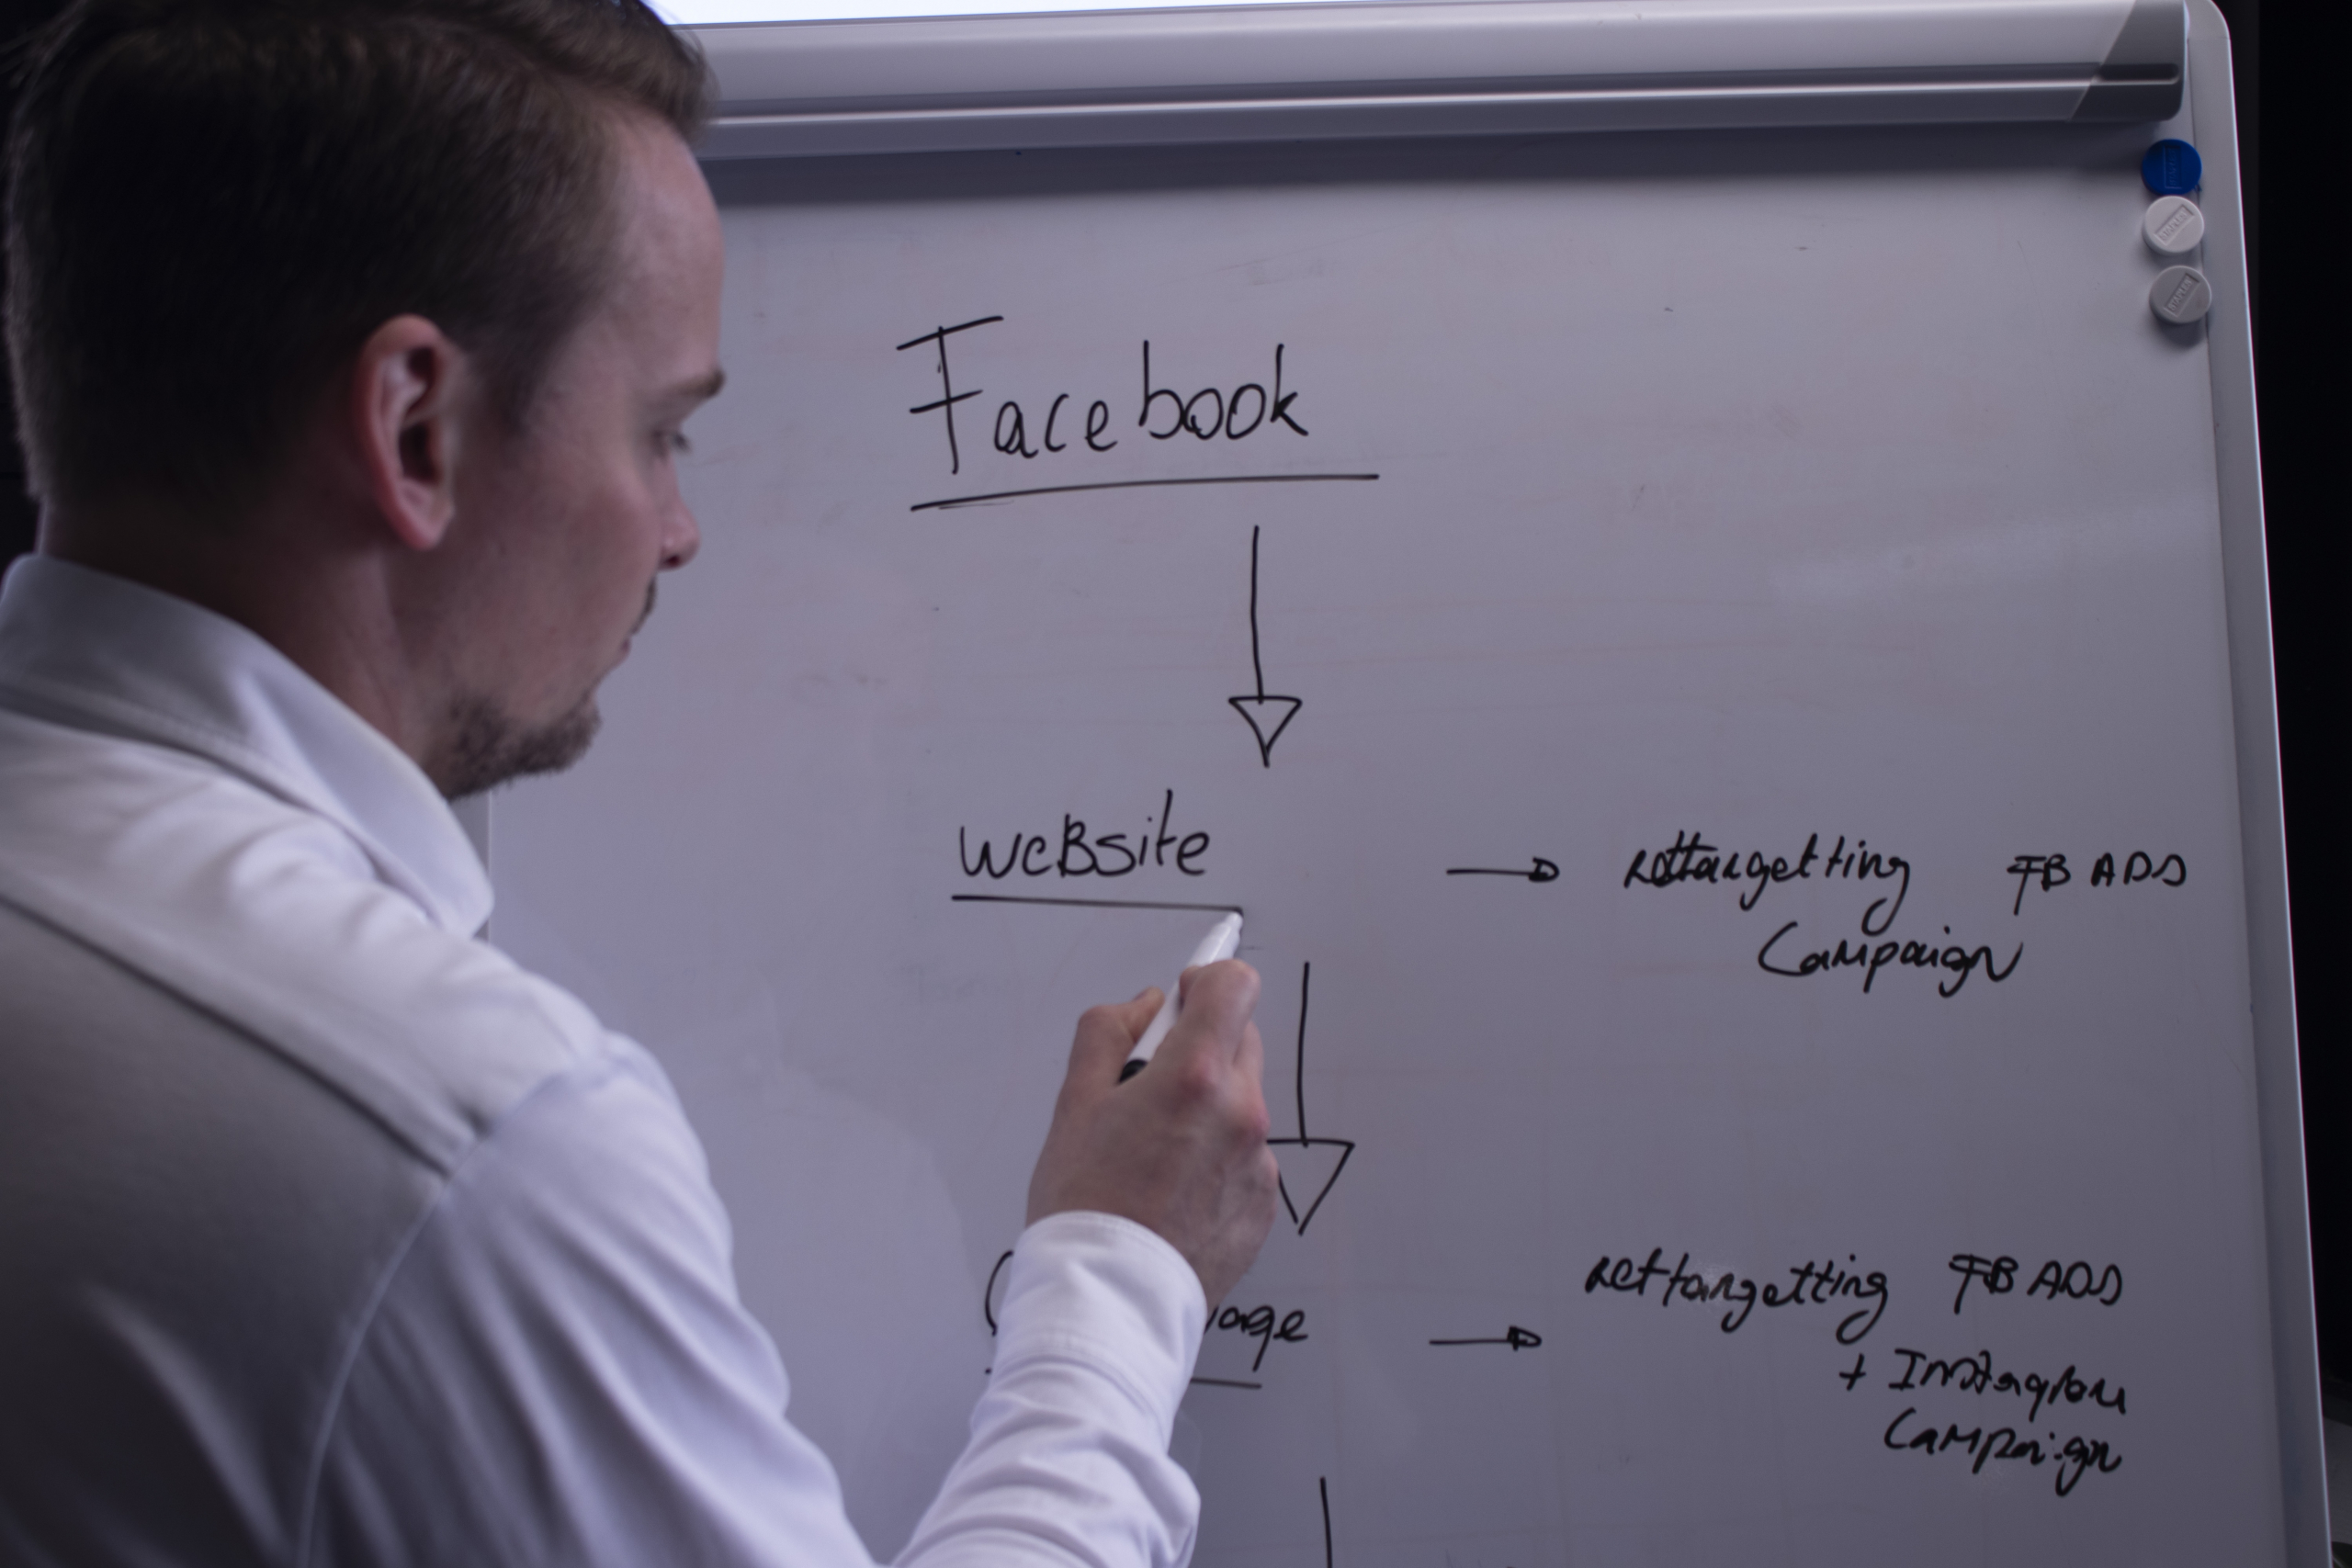 Basis vastgoedmarketing, sociale media marketing, klanten opvolgen, facebook, instagram